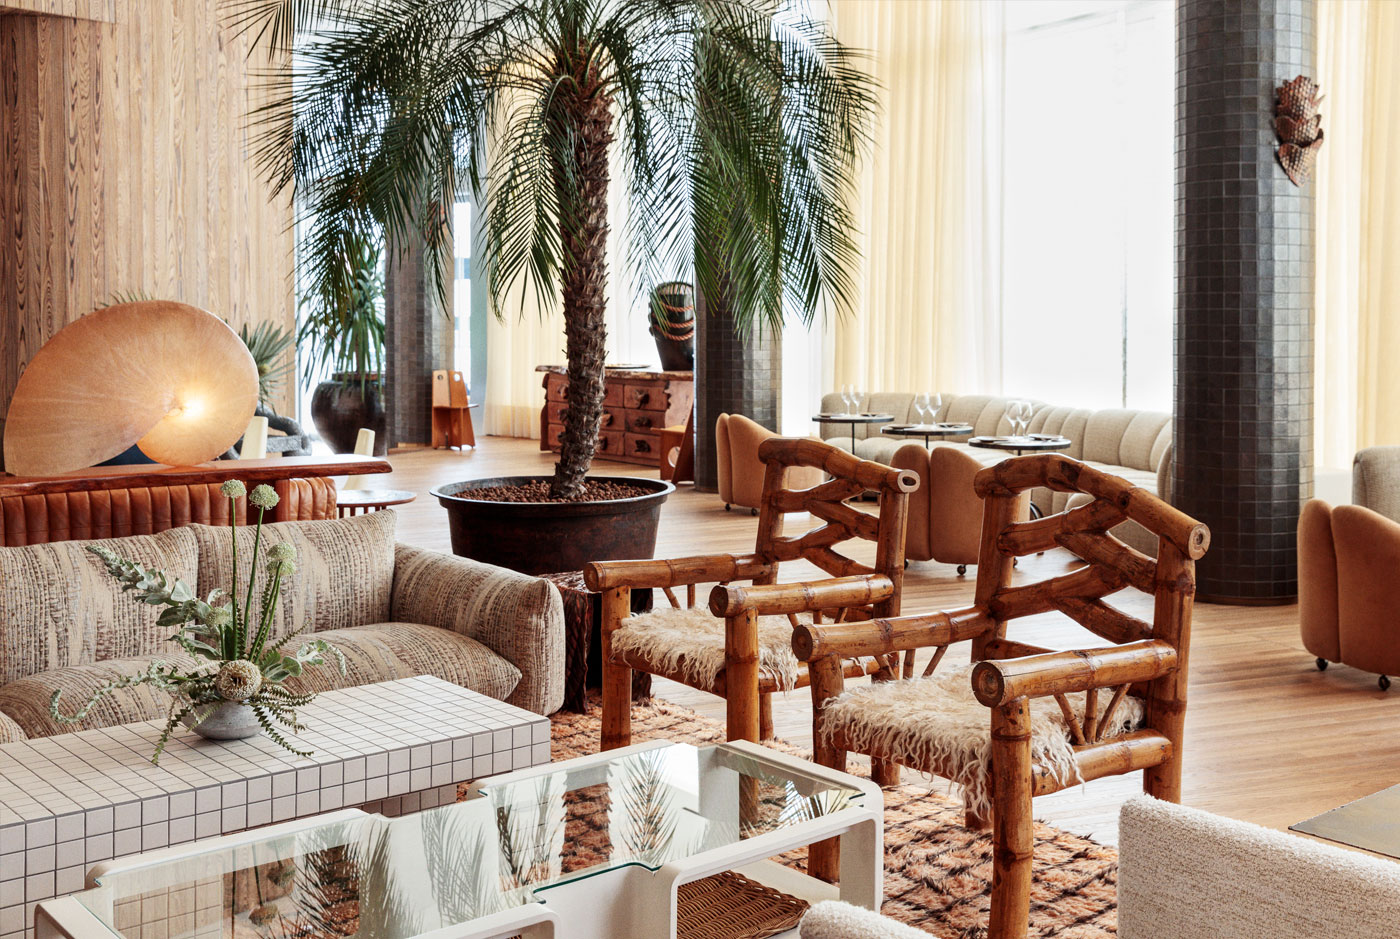 Santa Monica Proper Hotel | Luxury Hotel near Santa Monica Beach